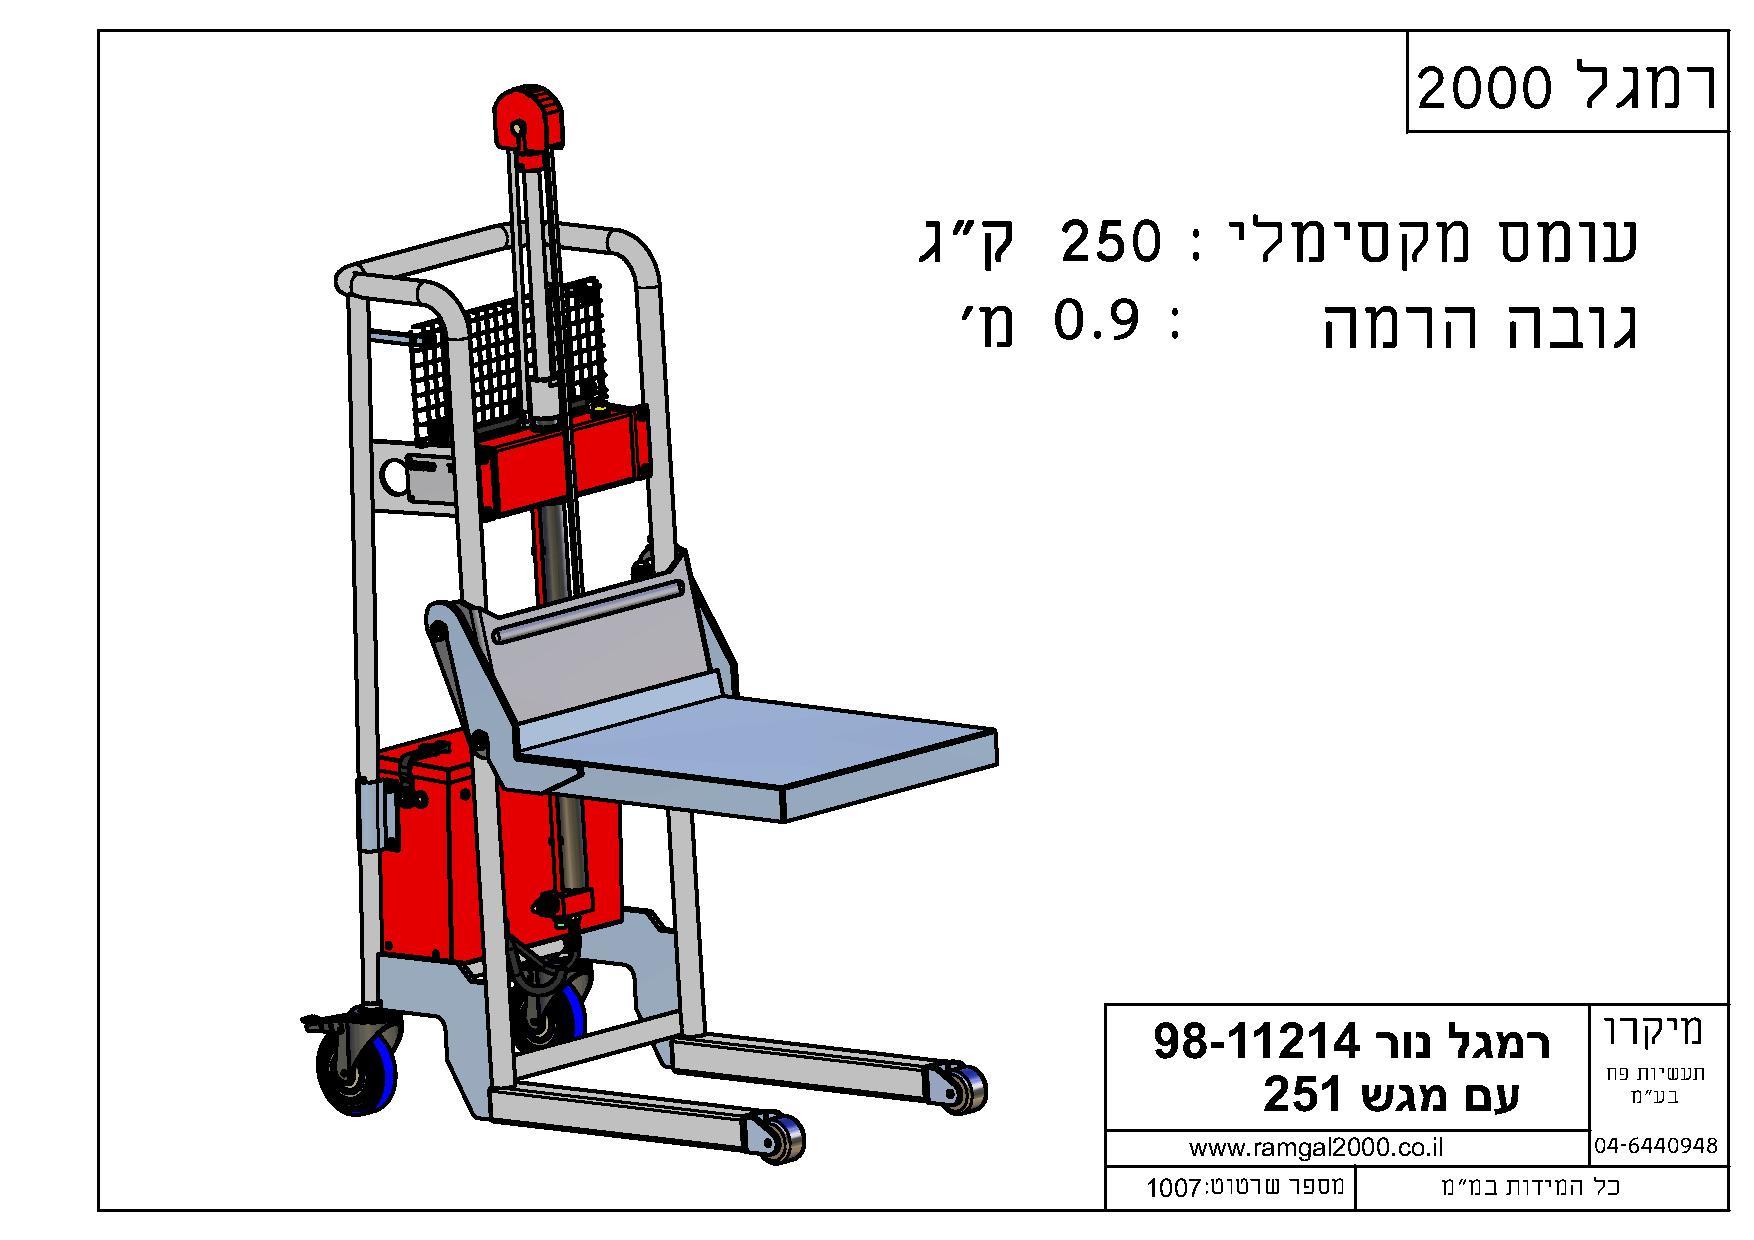 98-11214